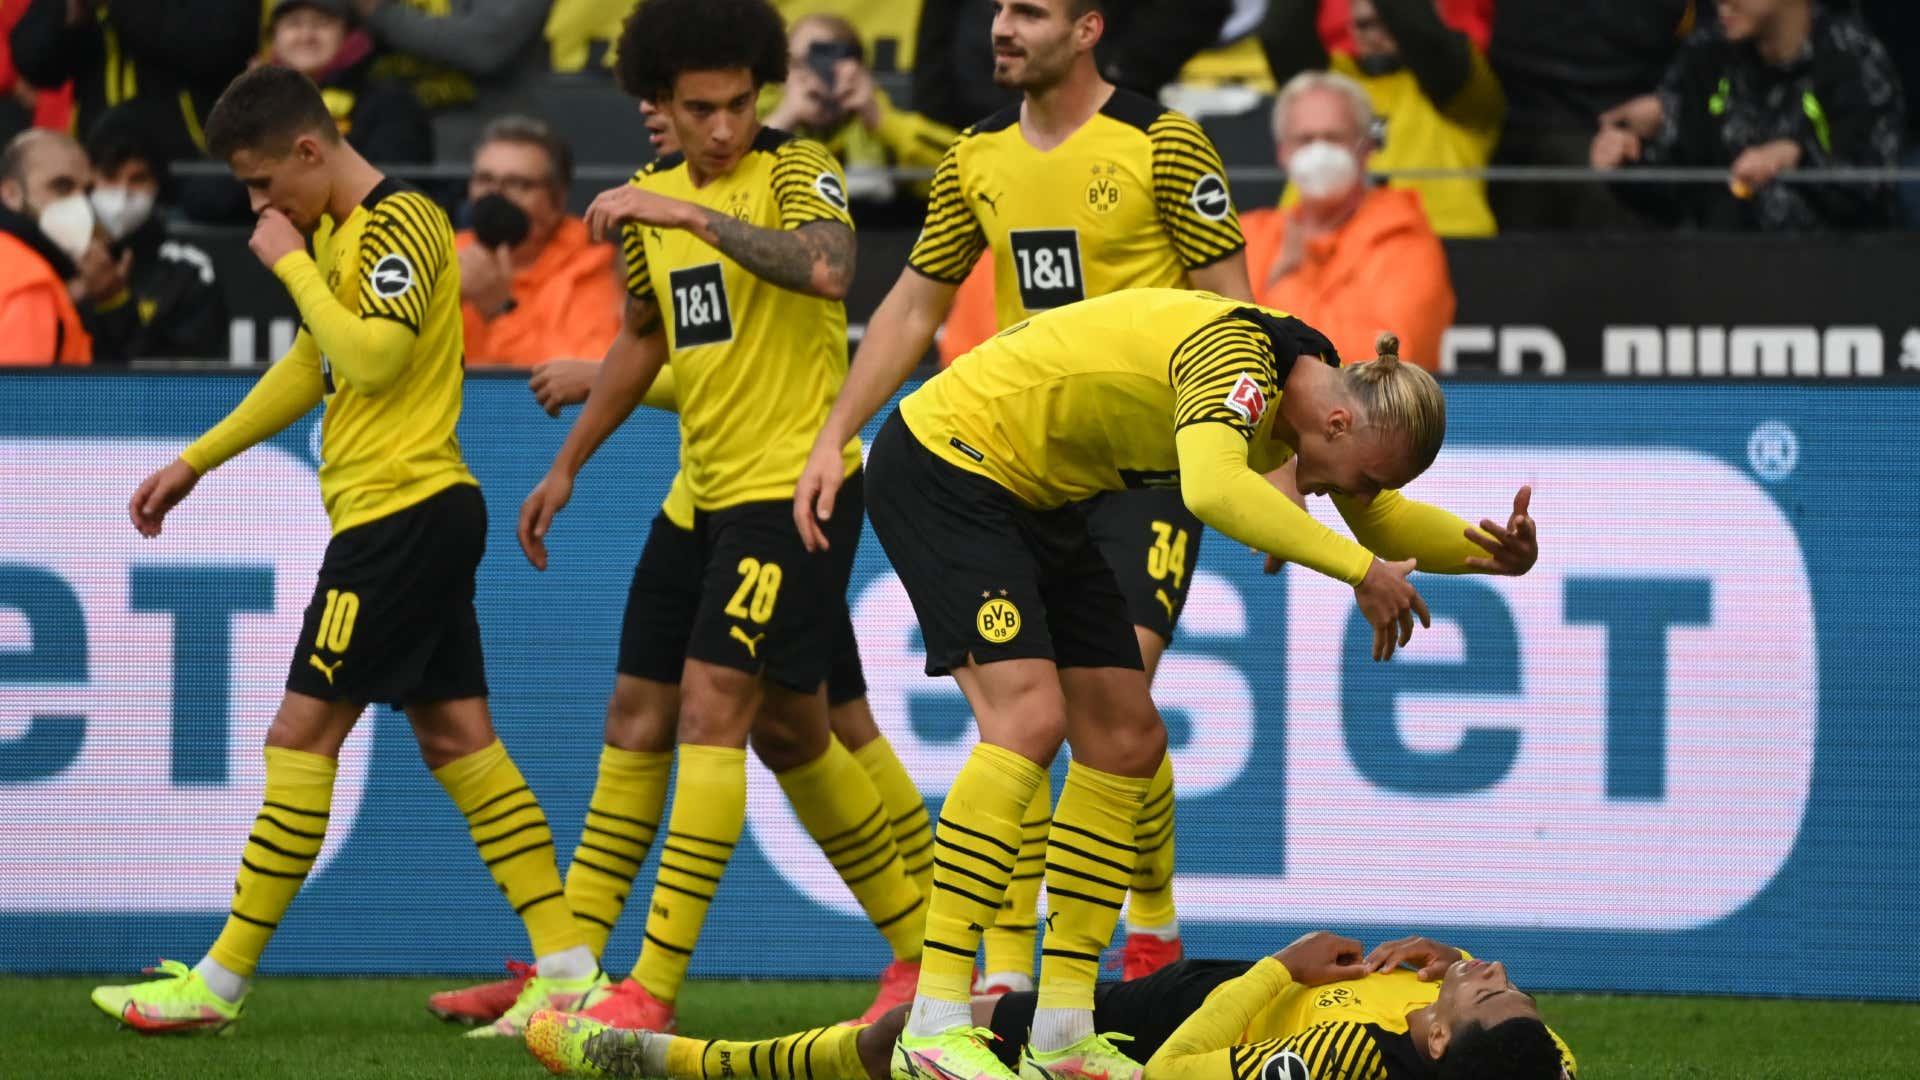 Borussia Dortmund vs. 1. FSV Mainz 05 Live-Kommentar und Ergebnis, 16.10.21, Bundesliga | Goal.com